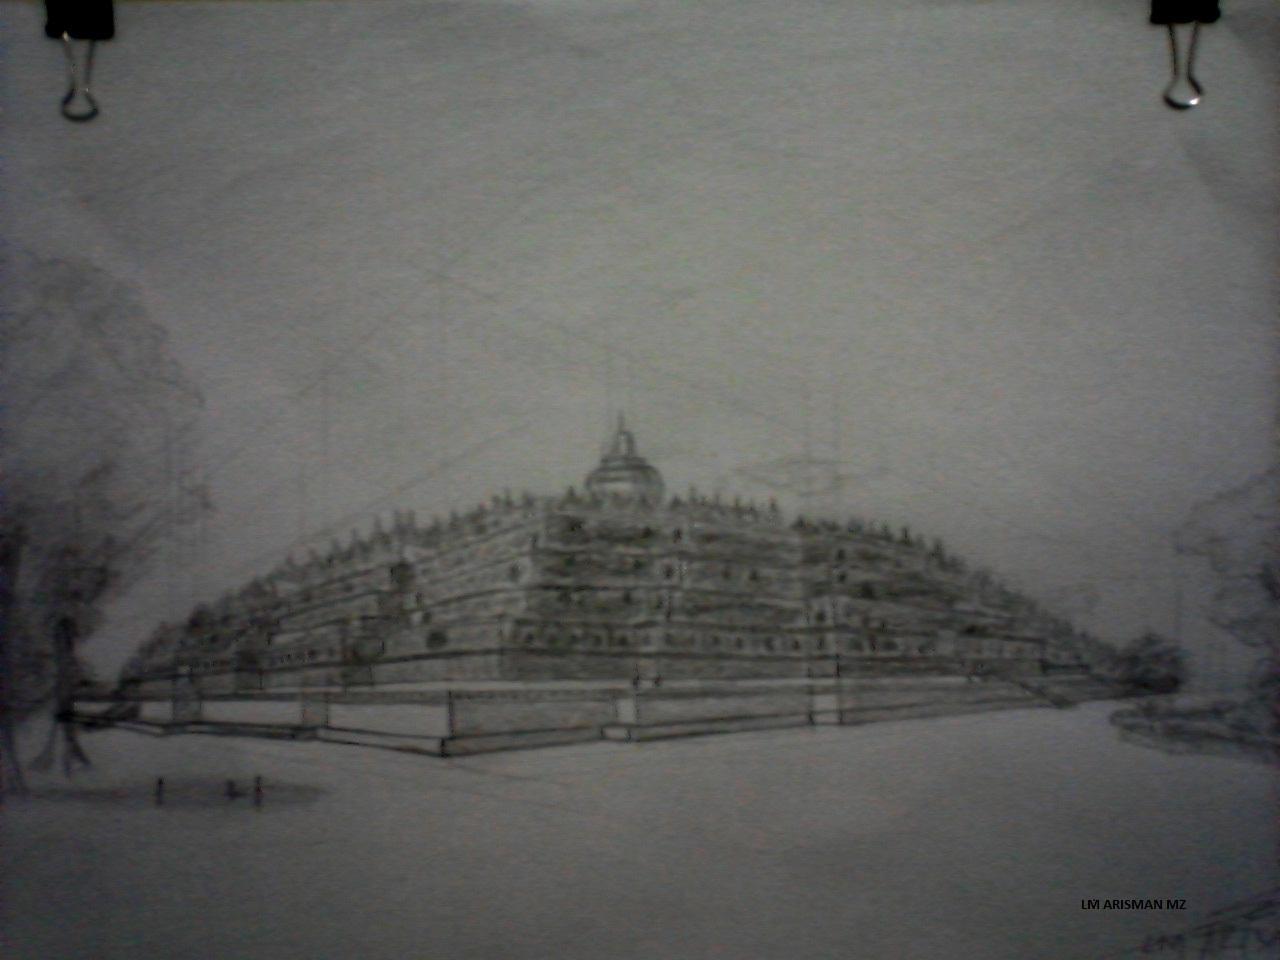 Koleksi Gambar Sketsa Pensil Candi Borobudur